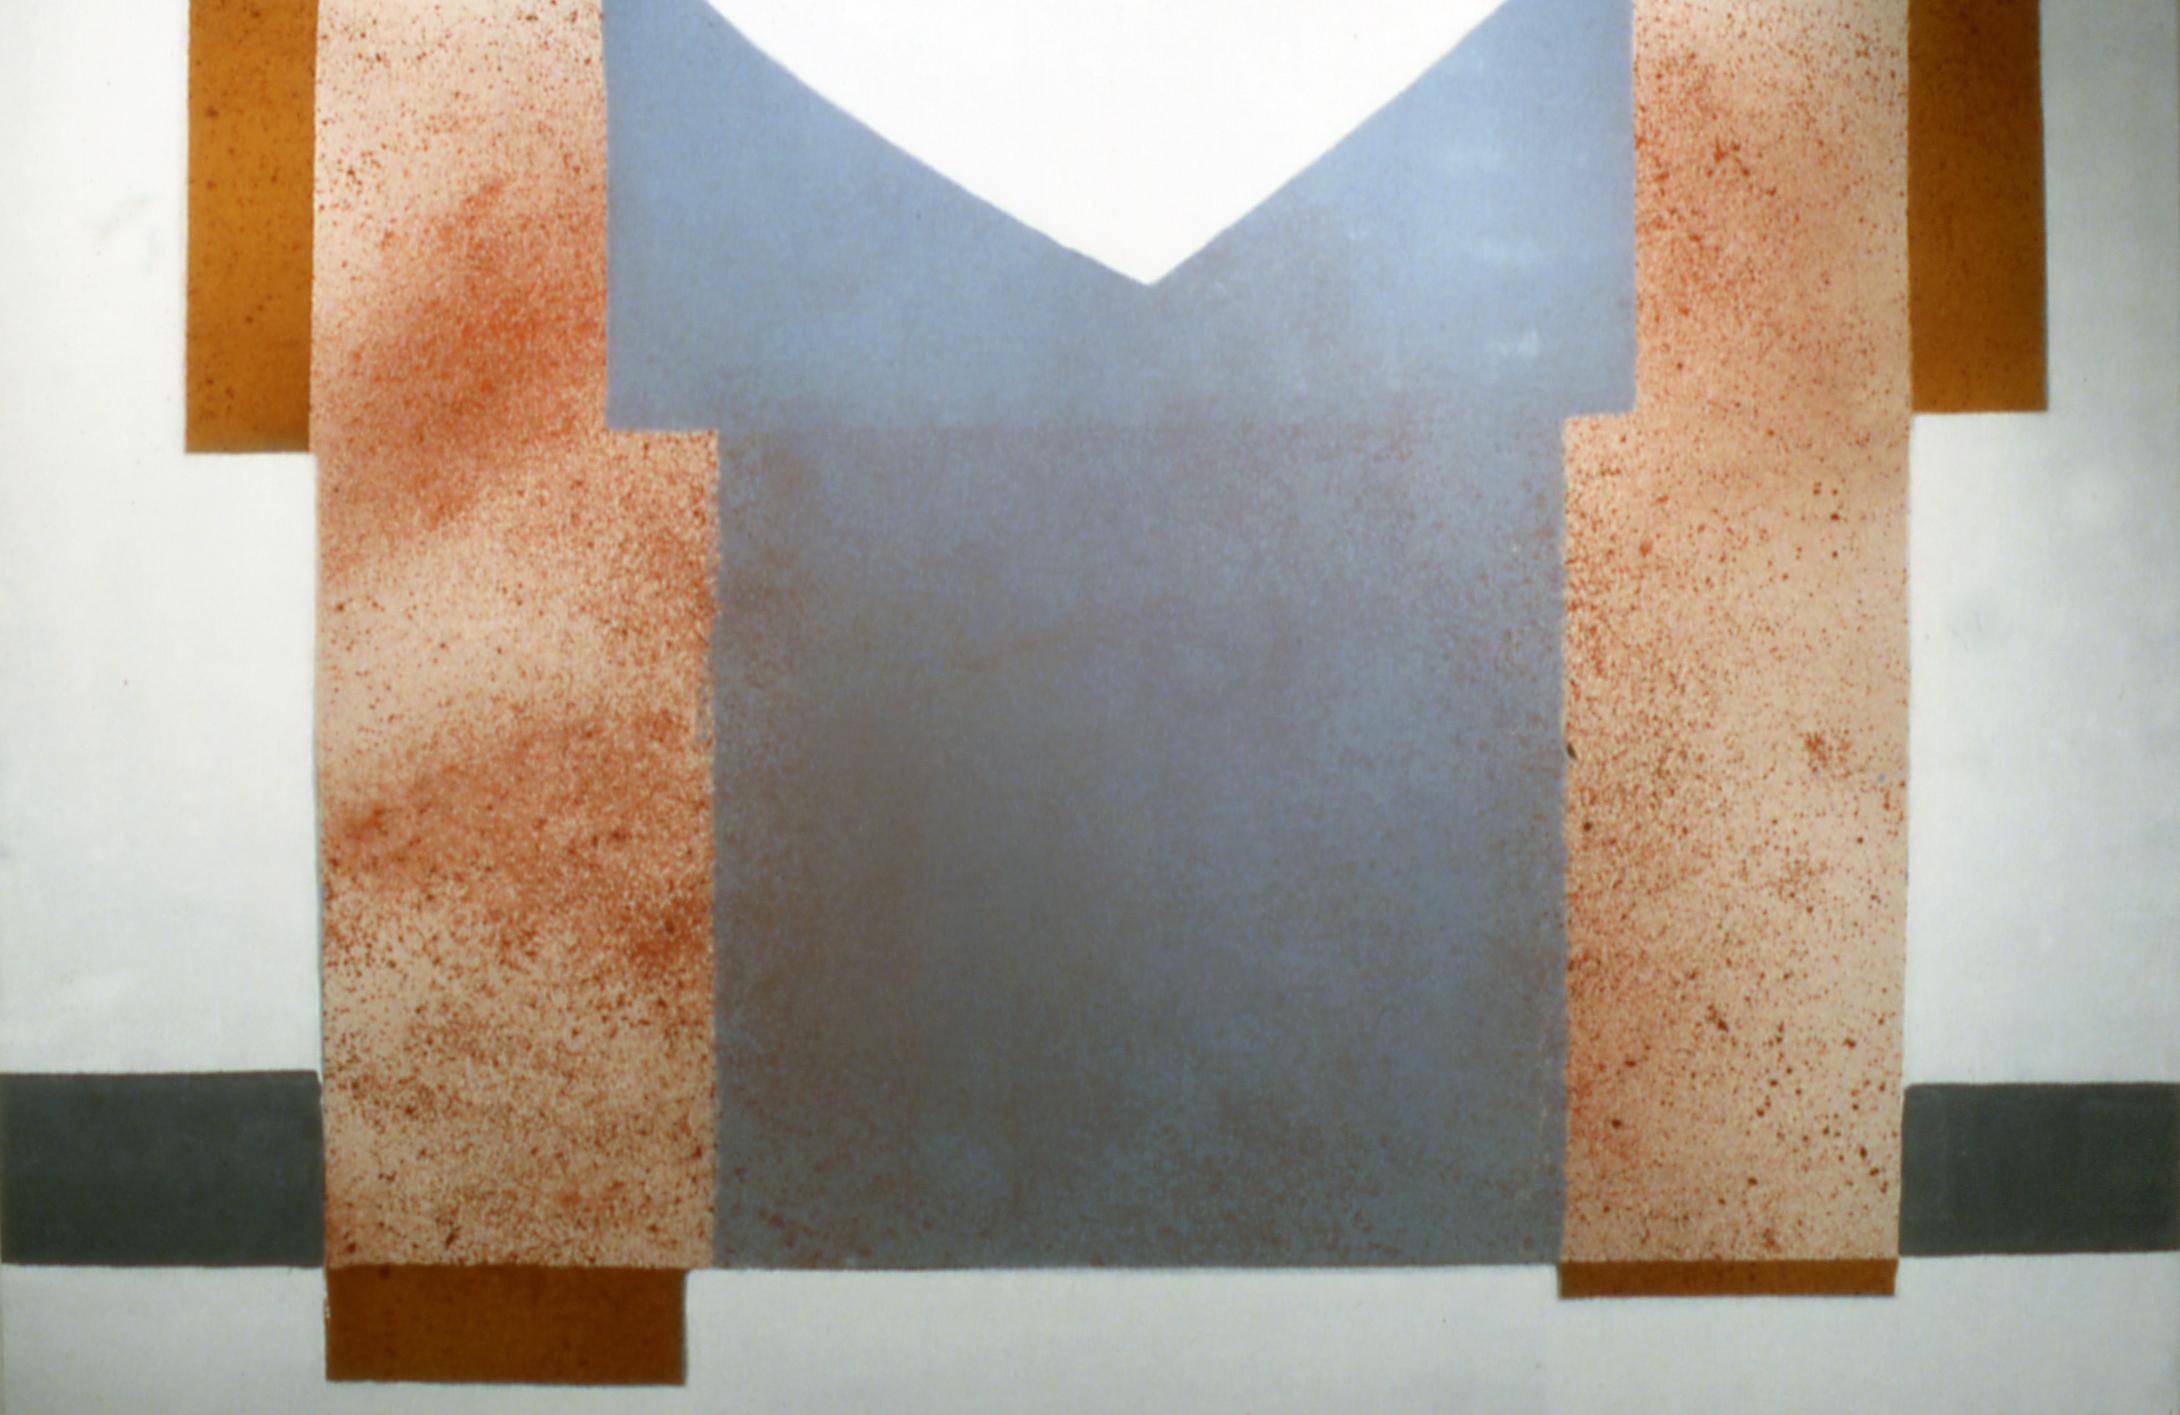 """Nikko    ,""  1994  acrylic on canvas  72"" x 80"""